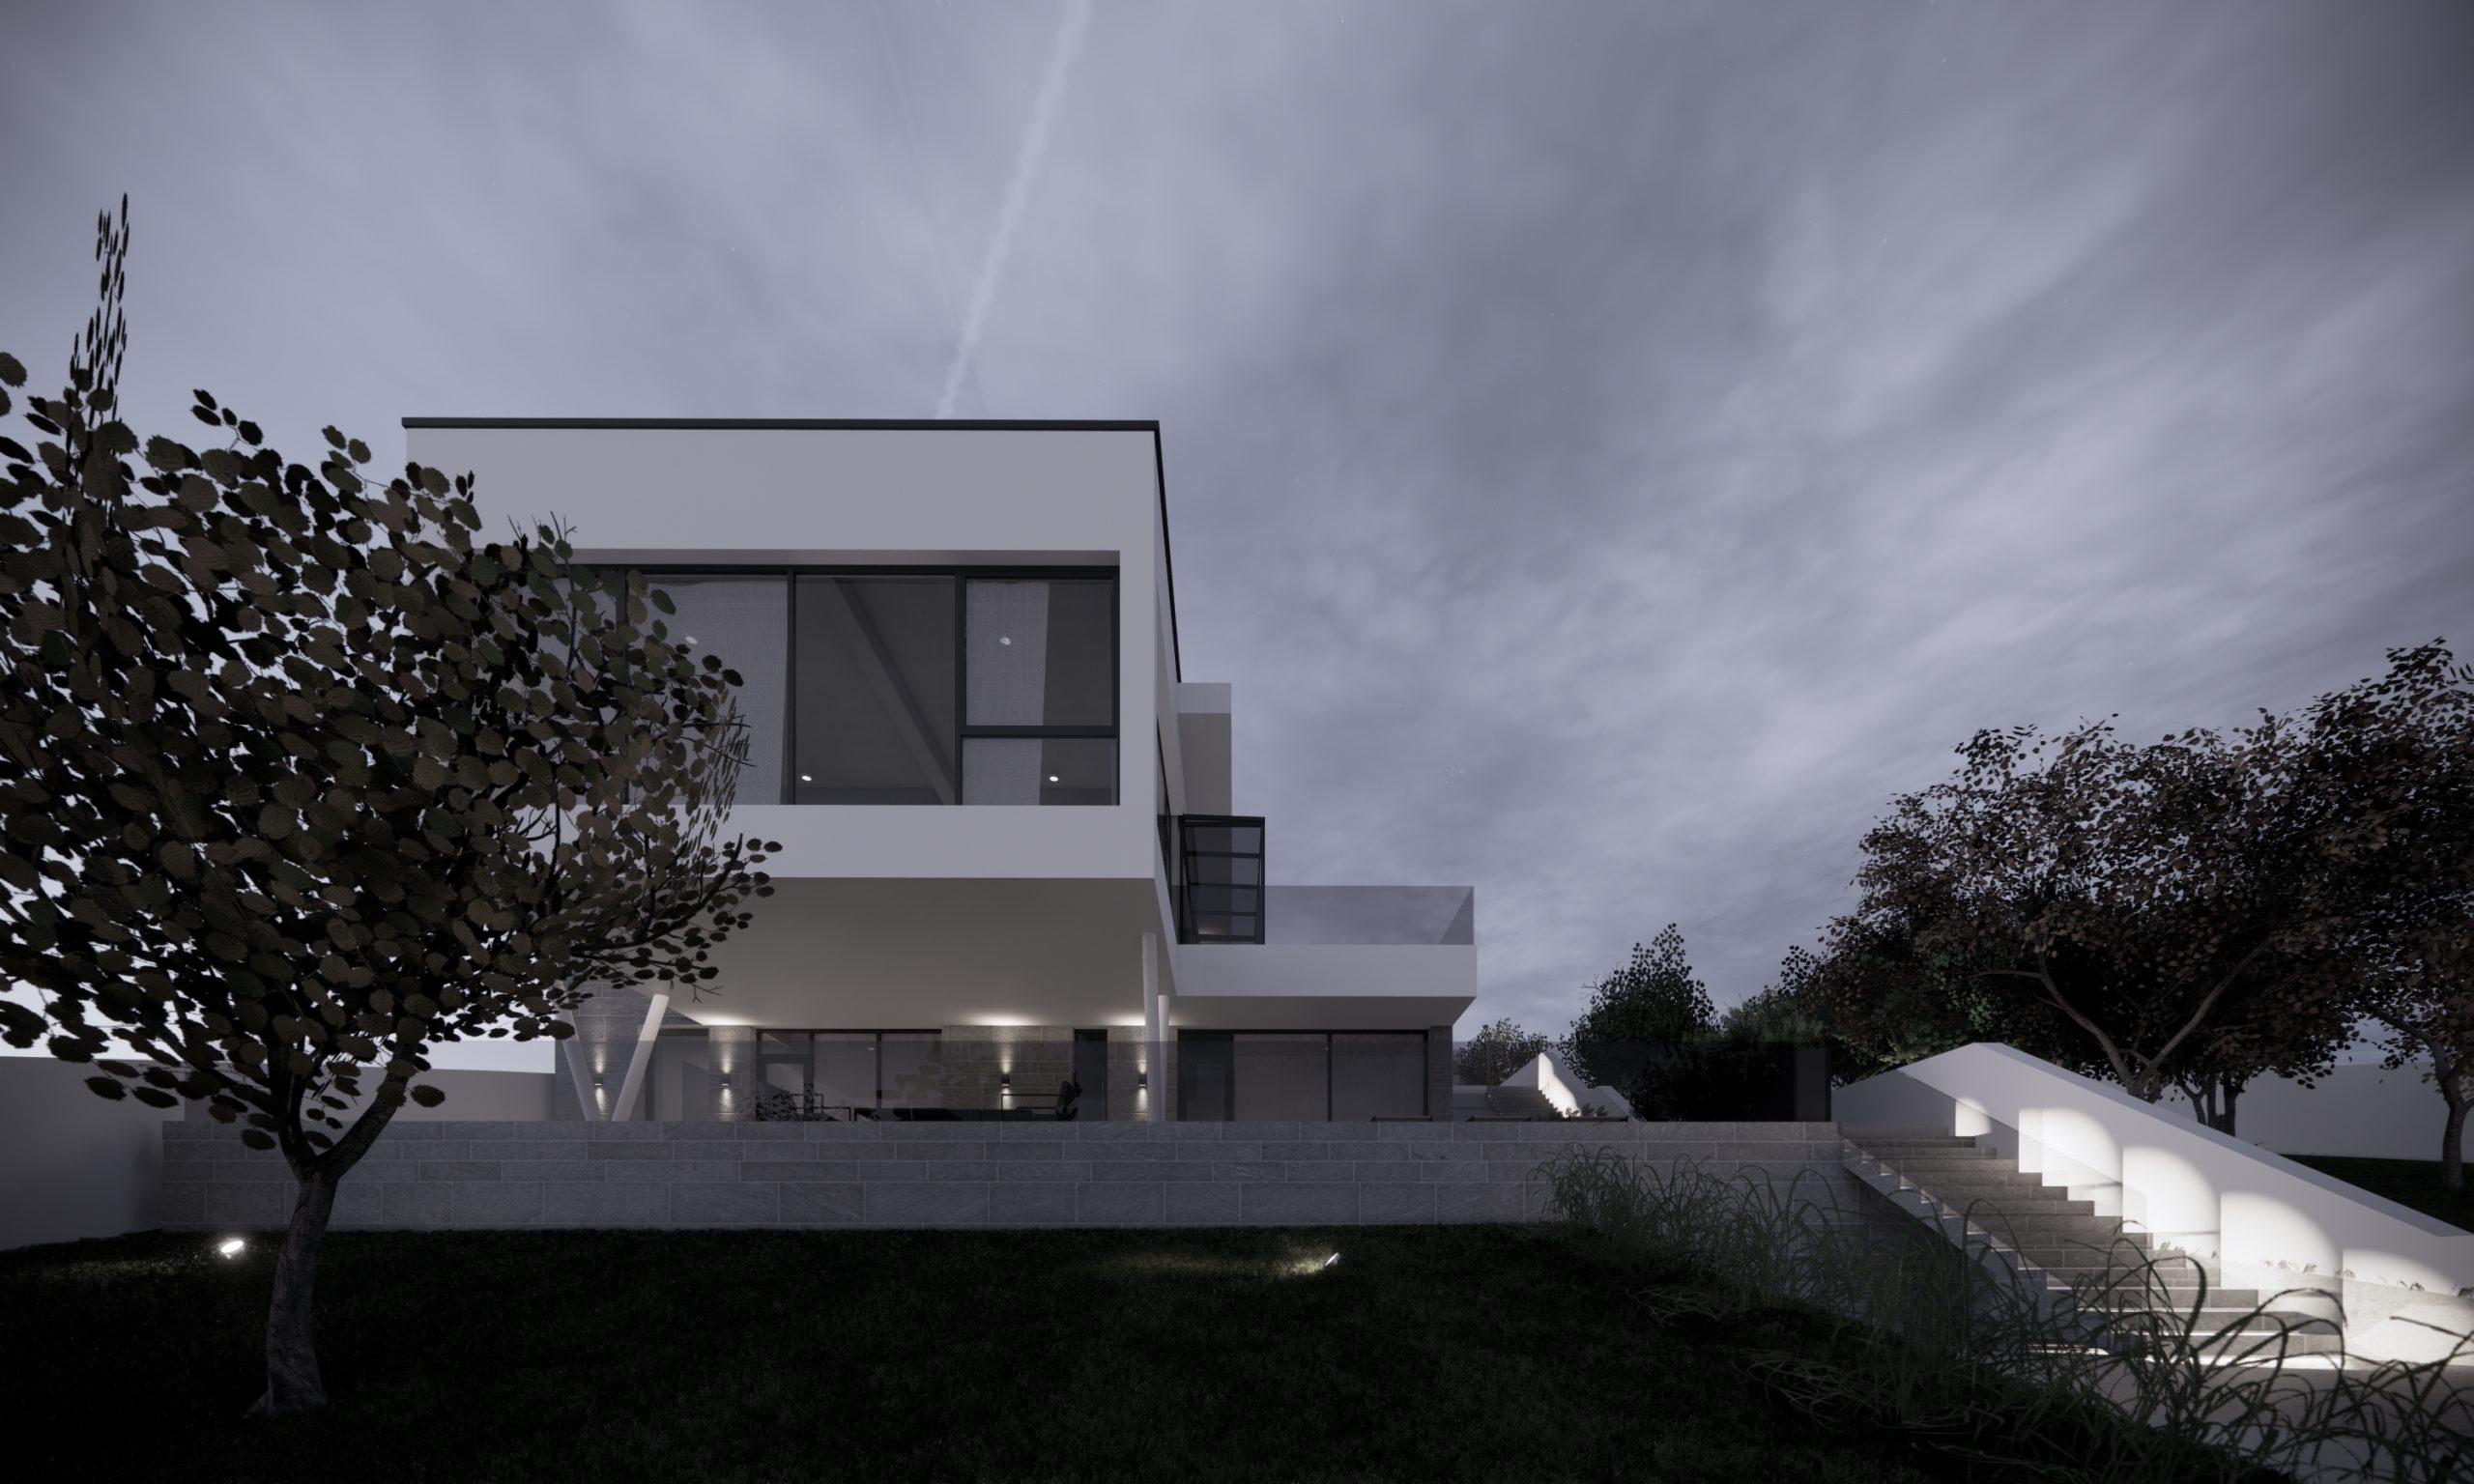 https://nbc-arhitect.ro/wp-content/uploads/2020/11/NBC-Arhitect-_-residential-_-2x-Snagov-_-Snagov-Romania_19-scaled.jpg